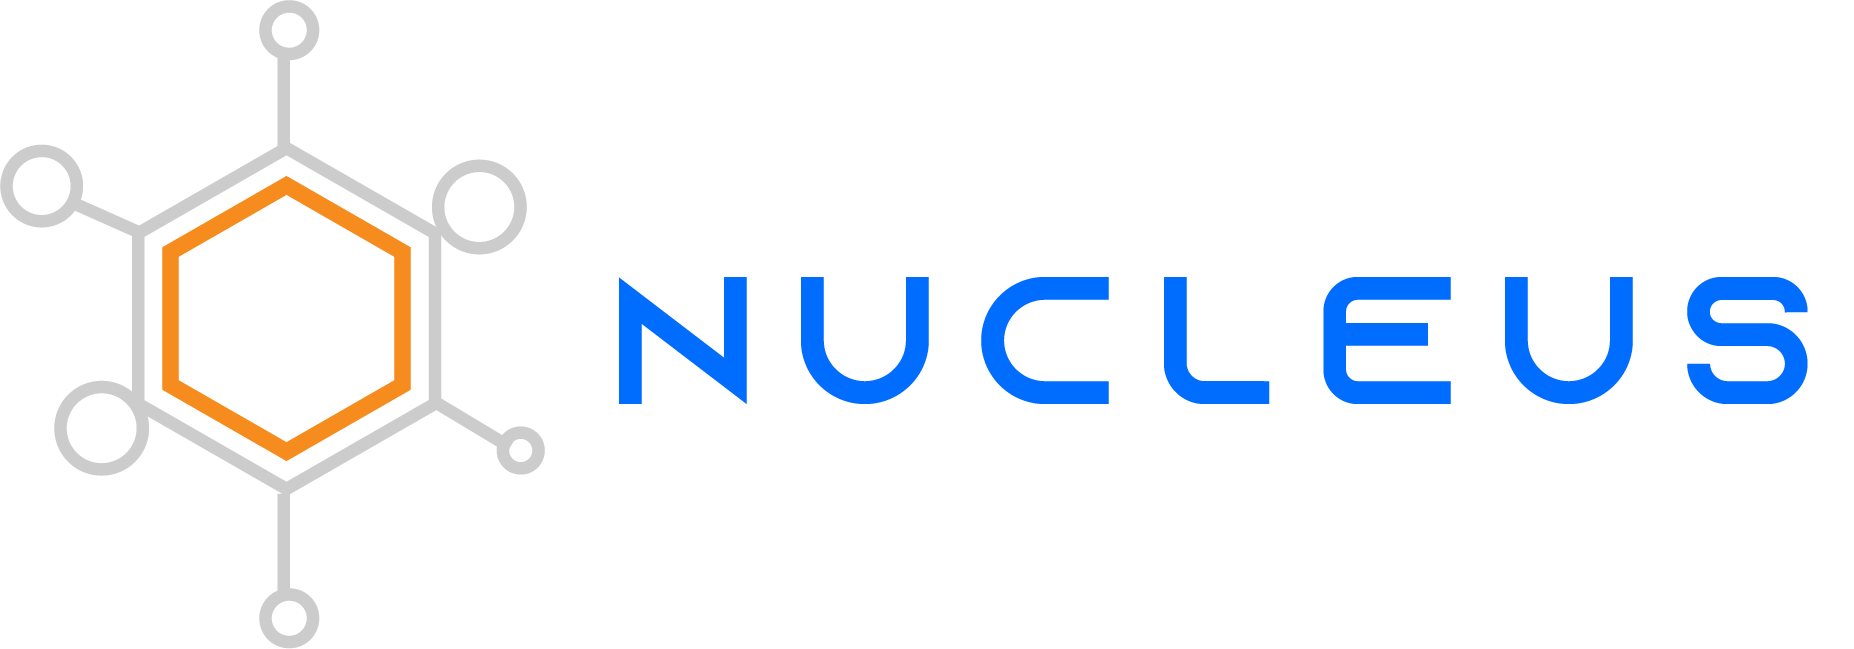 Nucleus Program Logo